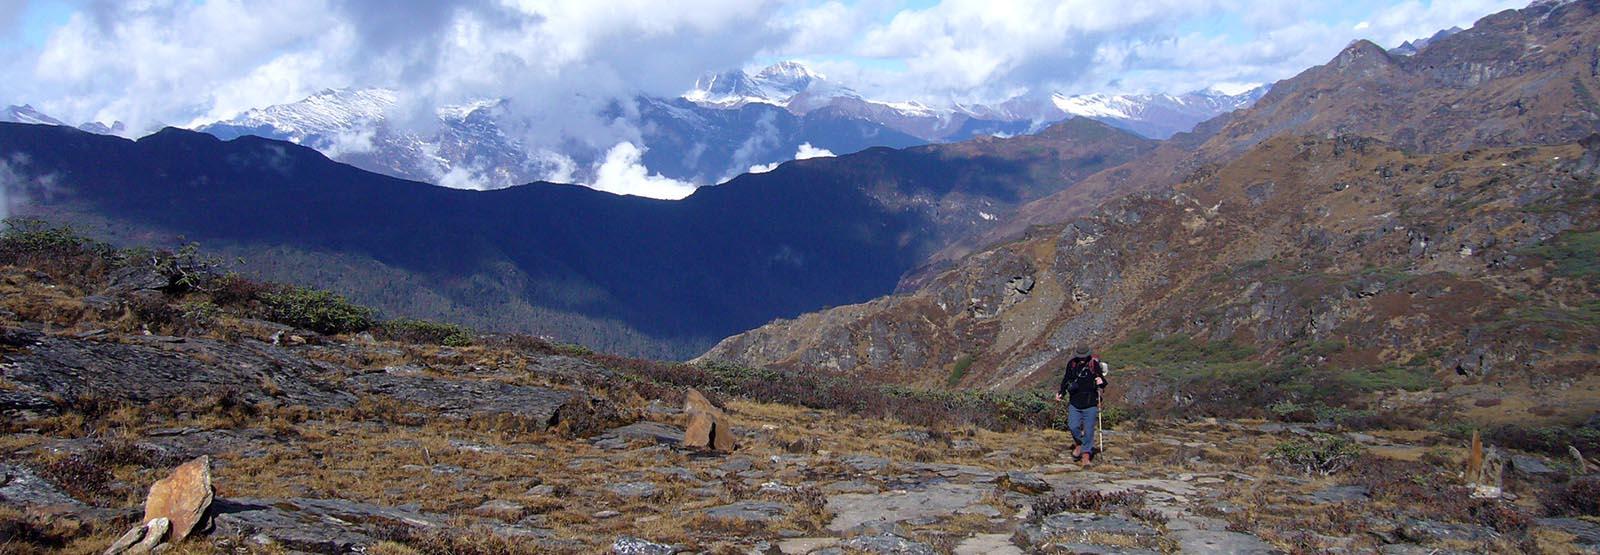 Bhutan Druk Path Trek Another World Adventures